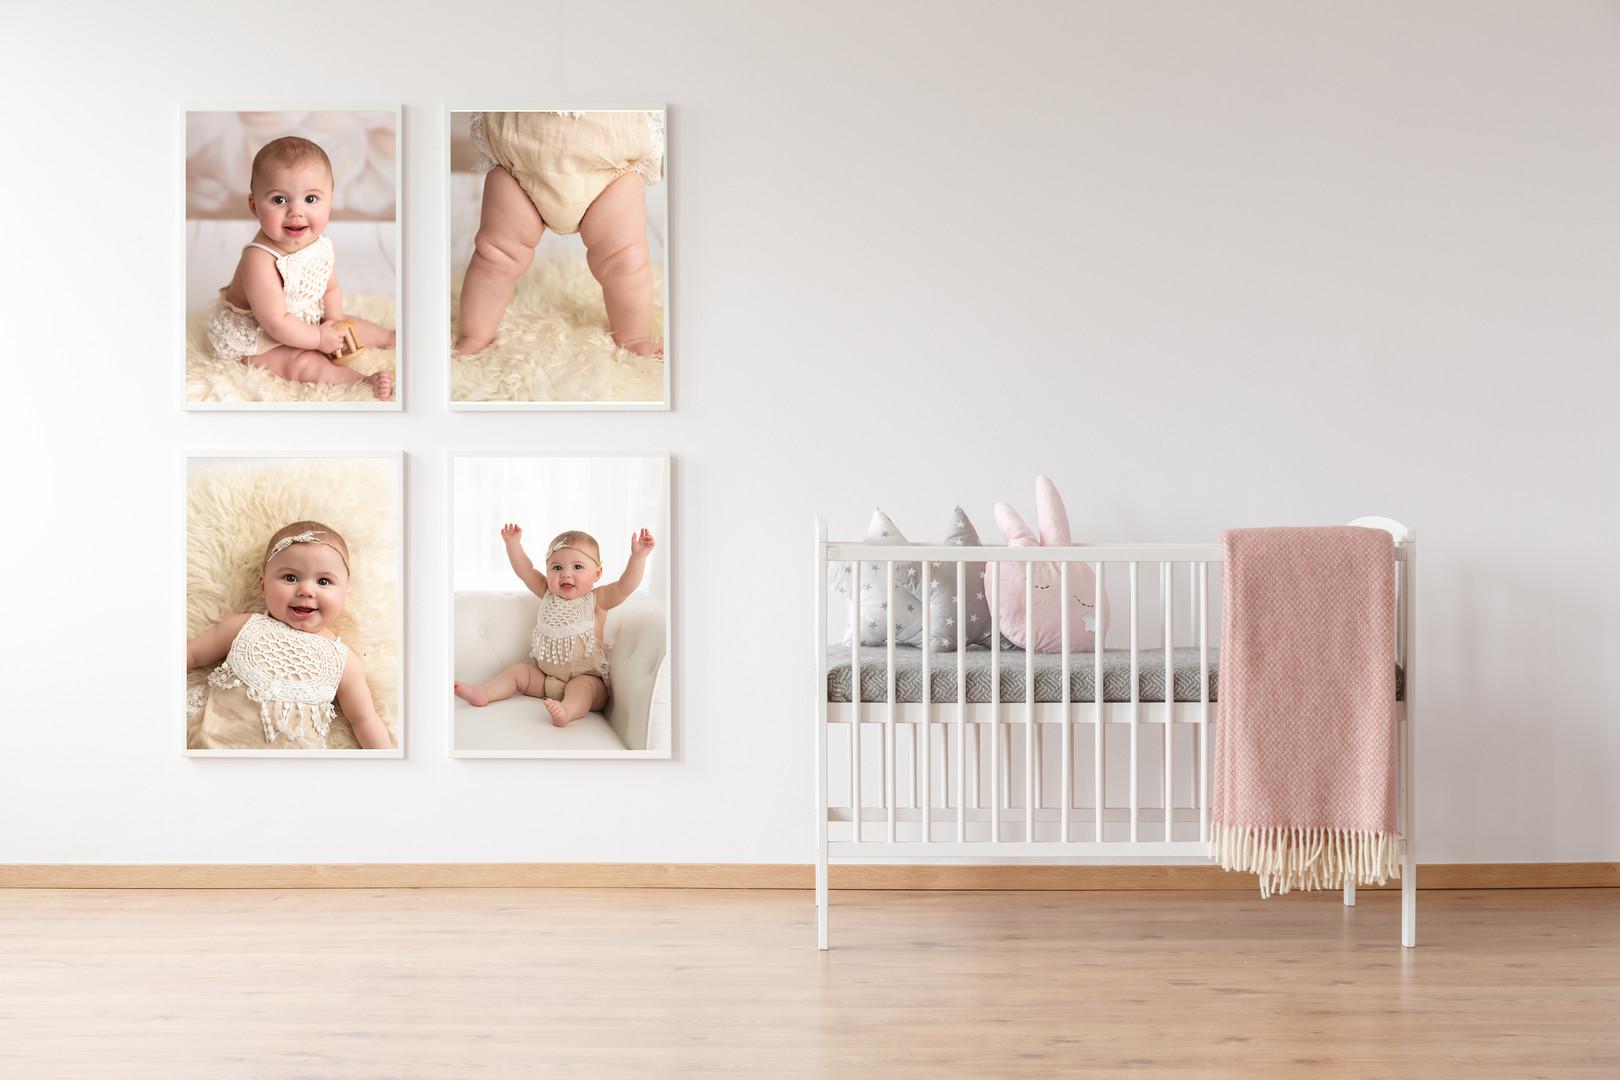 nursery2-200501-205641.psd.jpg